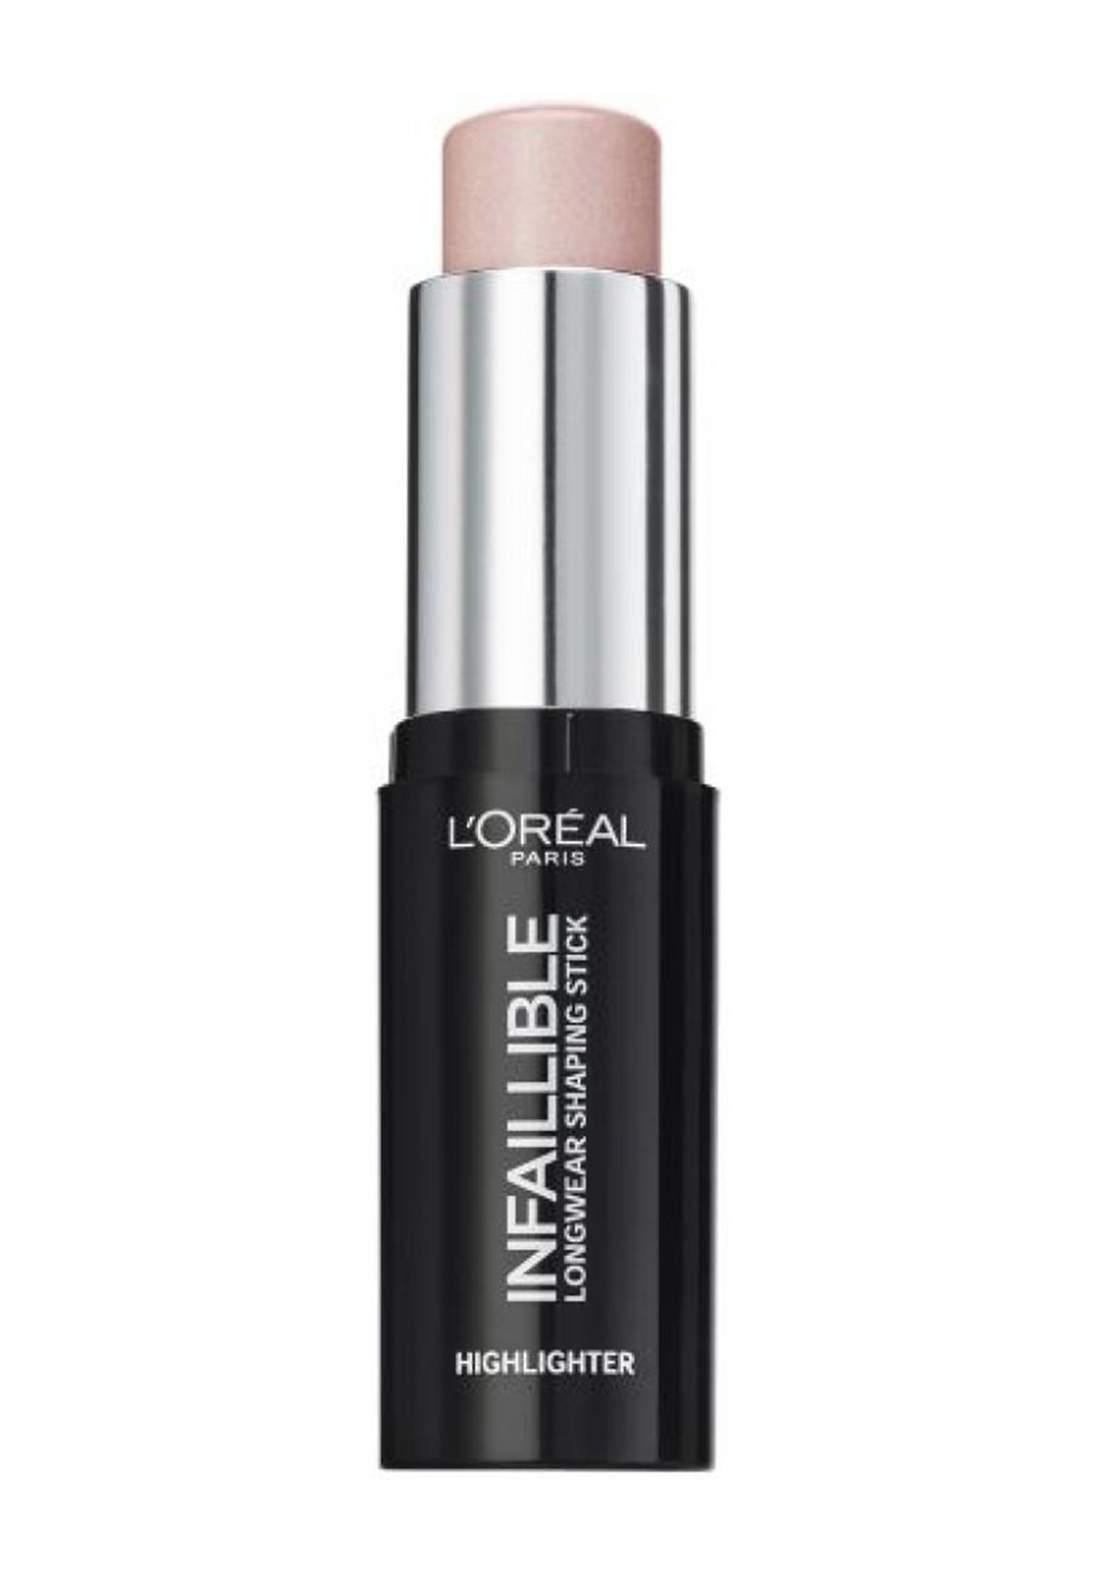 L'Oreal Paris Infallible Stobe Highlight Stick 503 Slay in Rose (027-1062) اضاءة كريمية للوجه